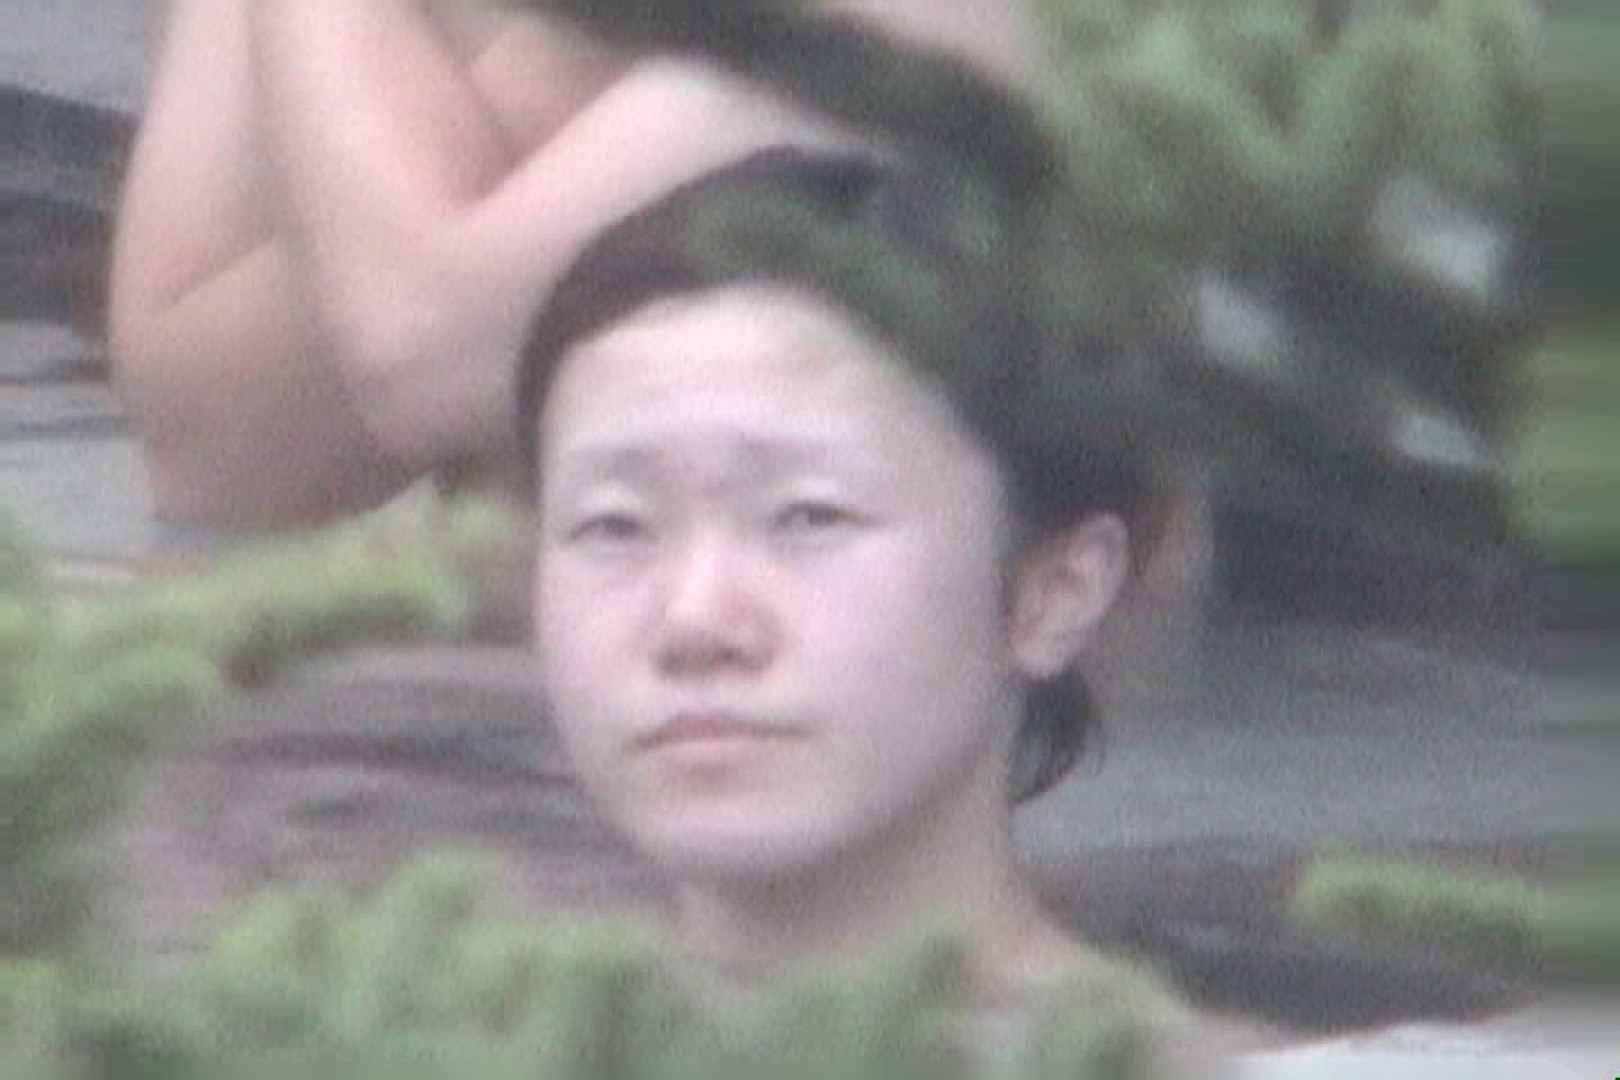 Aquaな露天風呂Vol.48【VIP限定】 OLのエロ生活   露天風呂  74連発 73